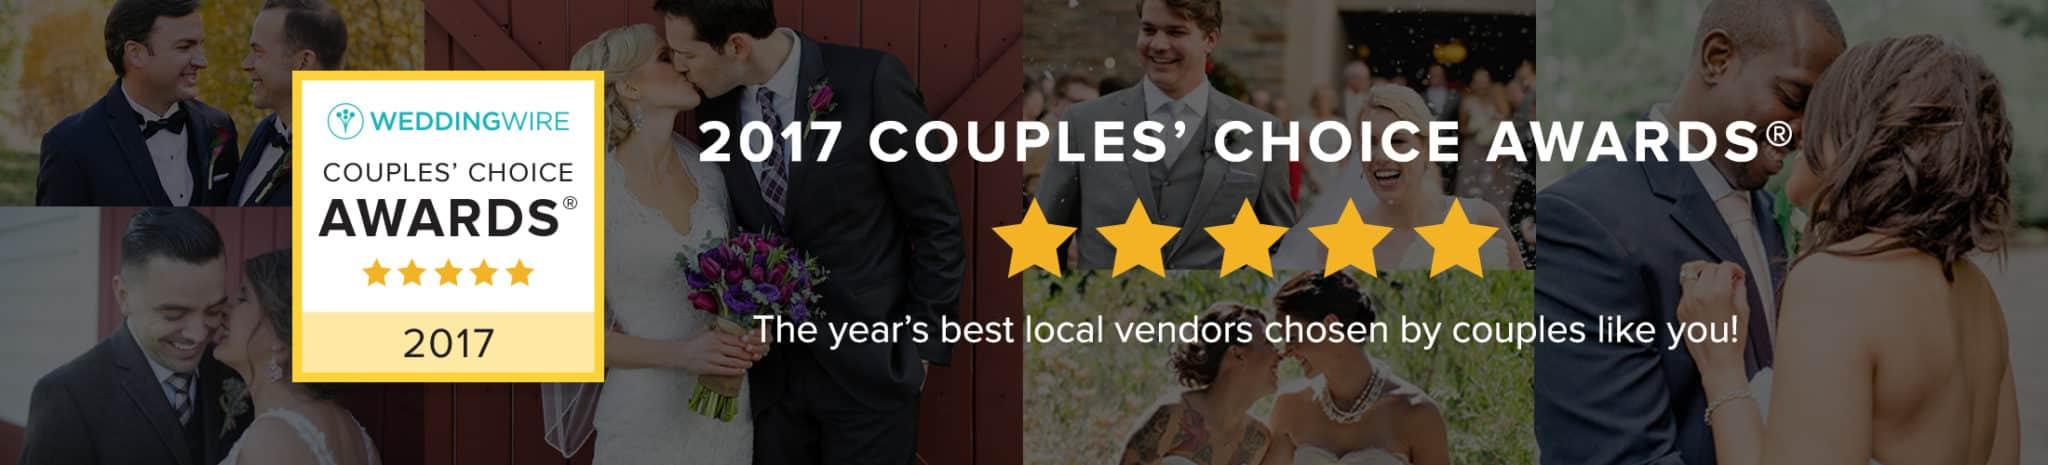 2017 WeddingWire Couples' Choice Award®